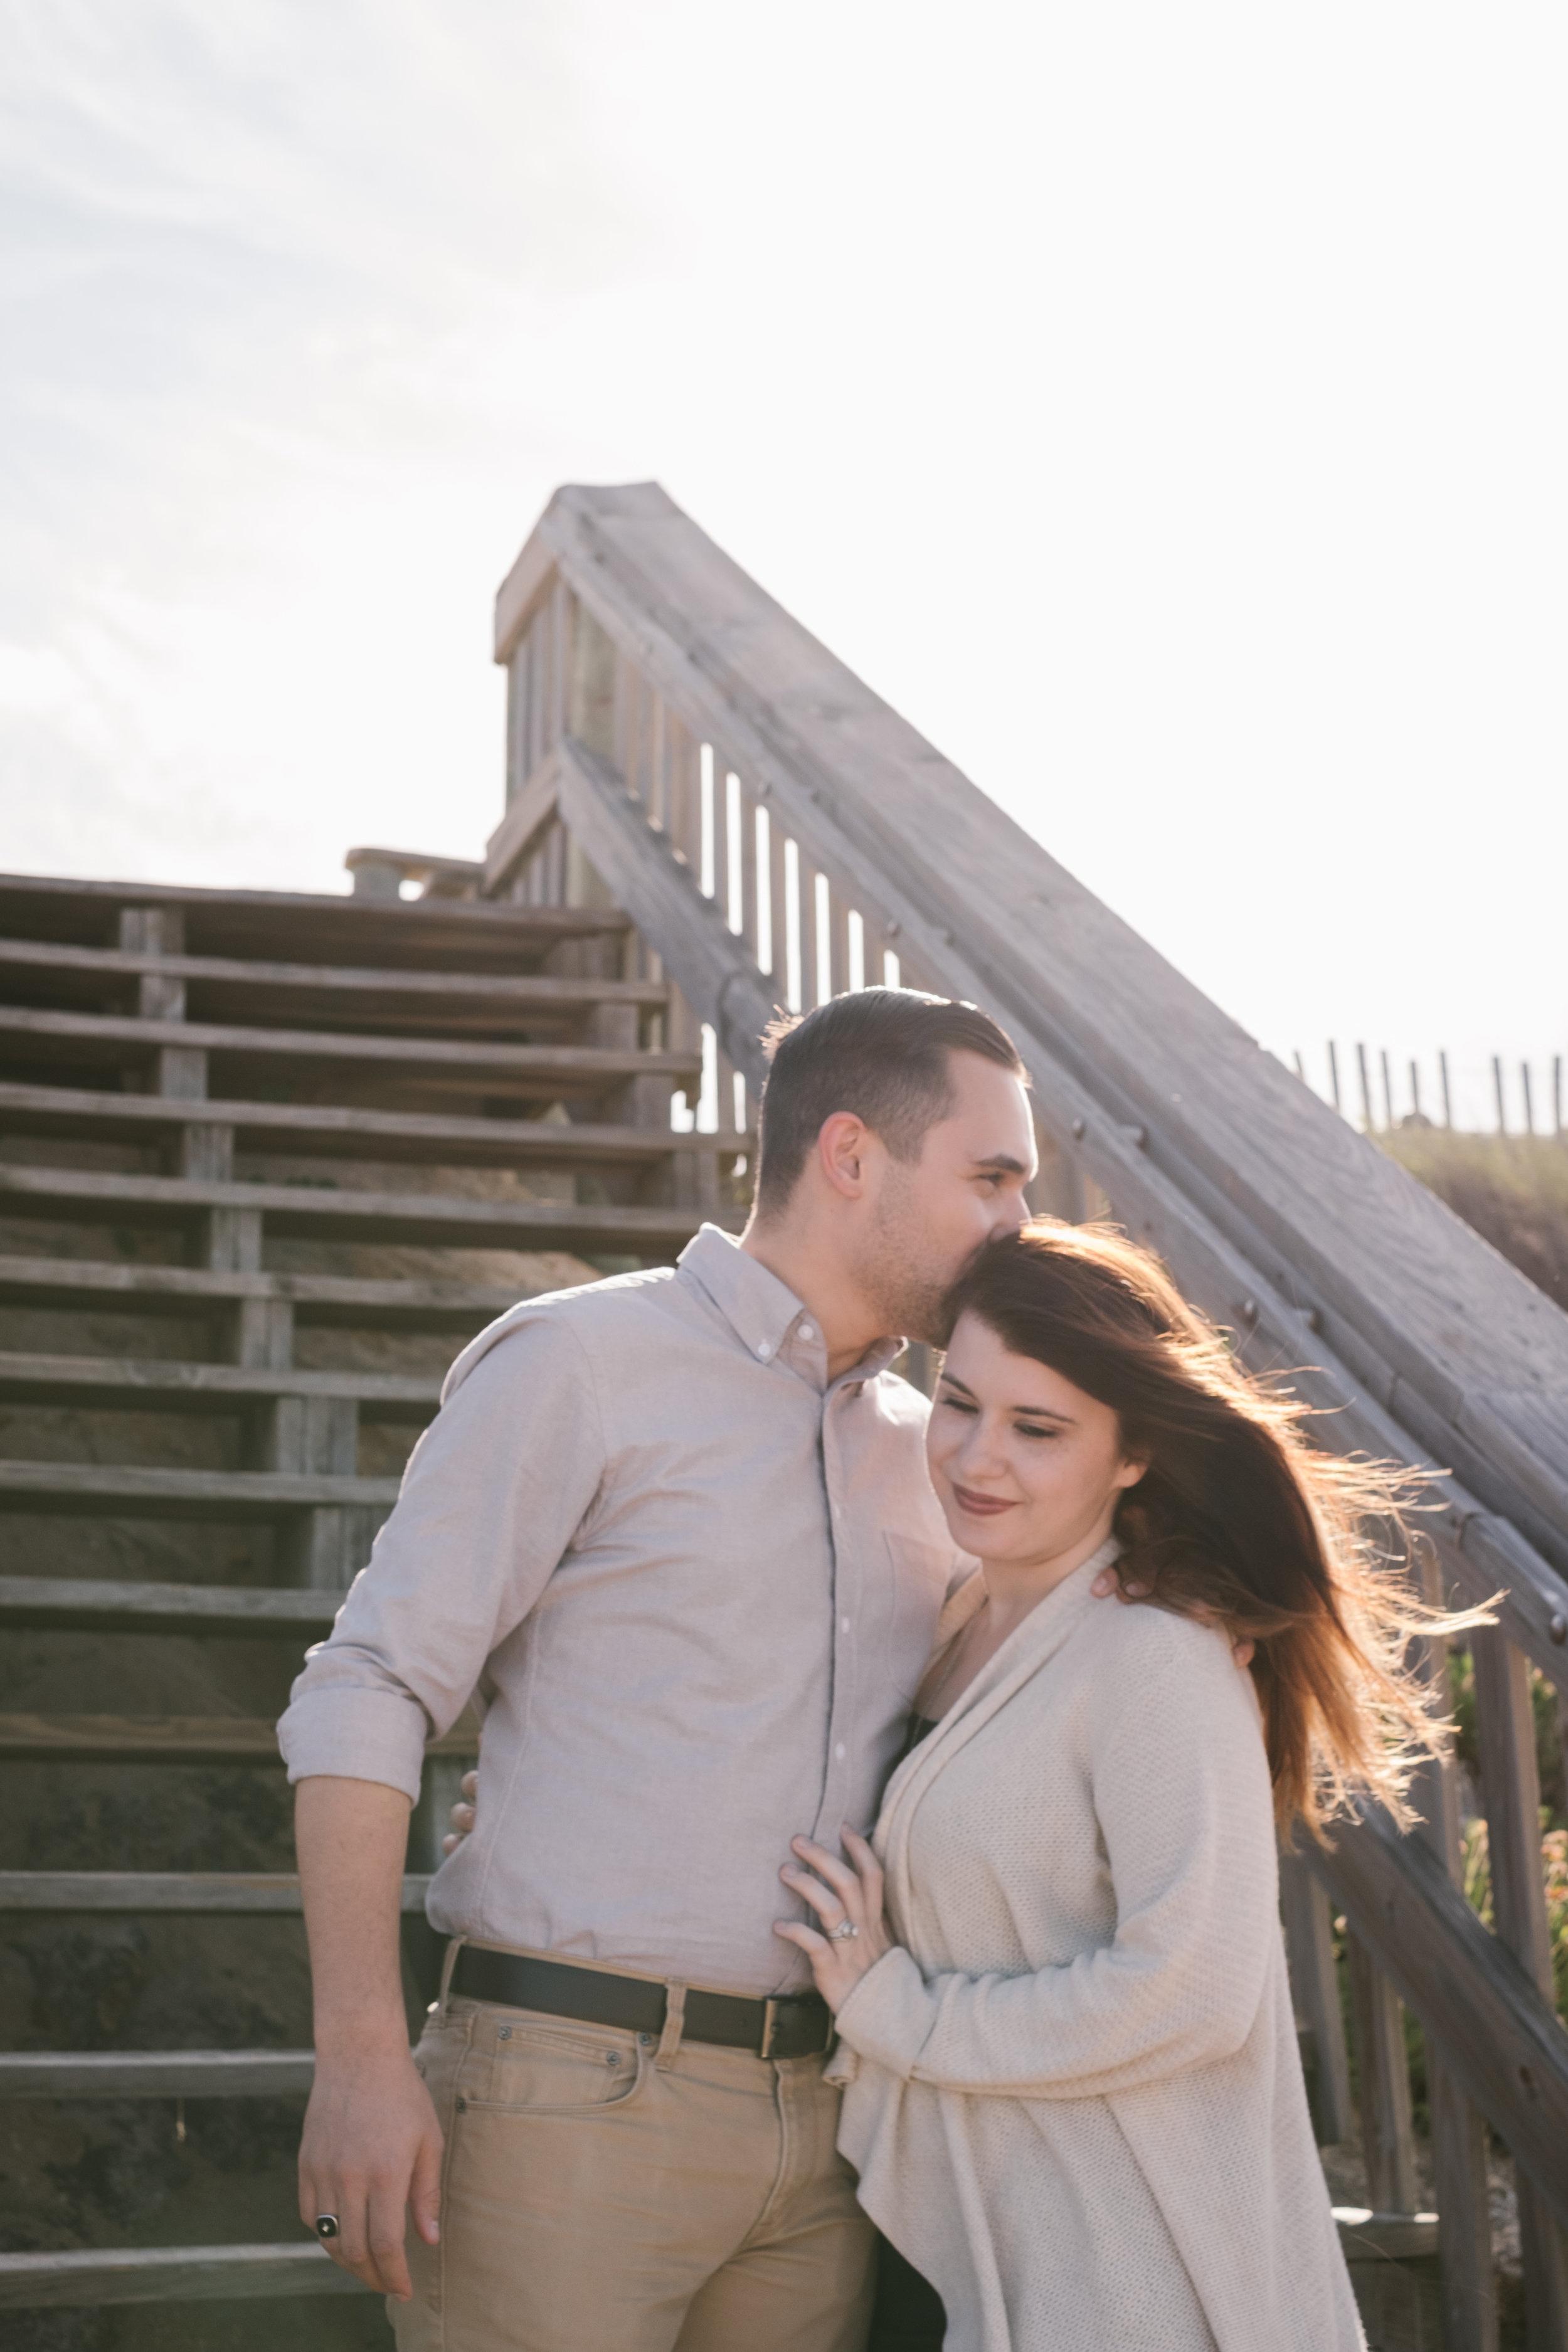 Flagler Beach FL Family Portrait Photographer - kate&co.